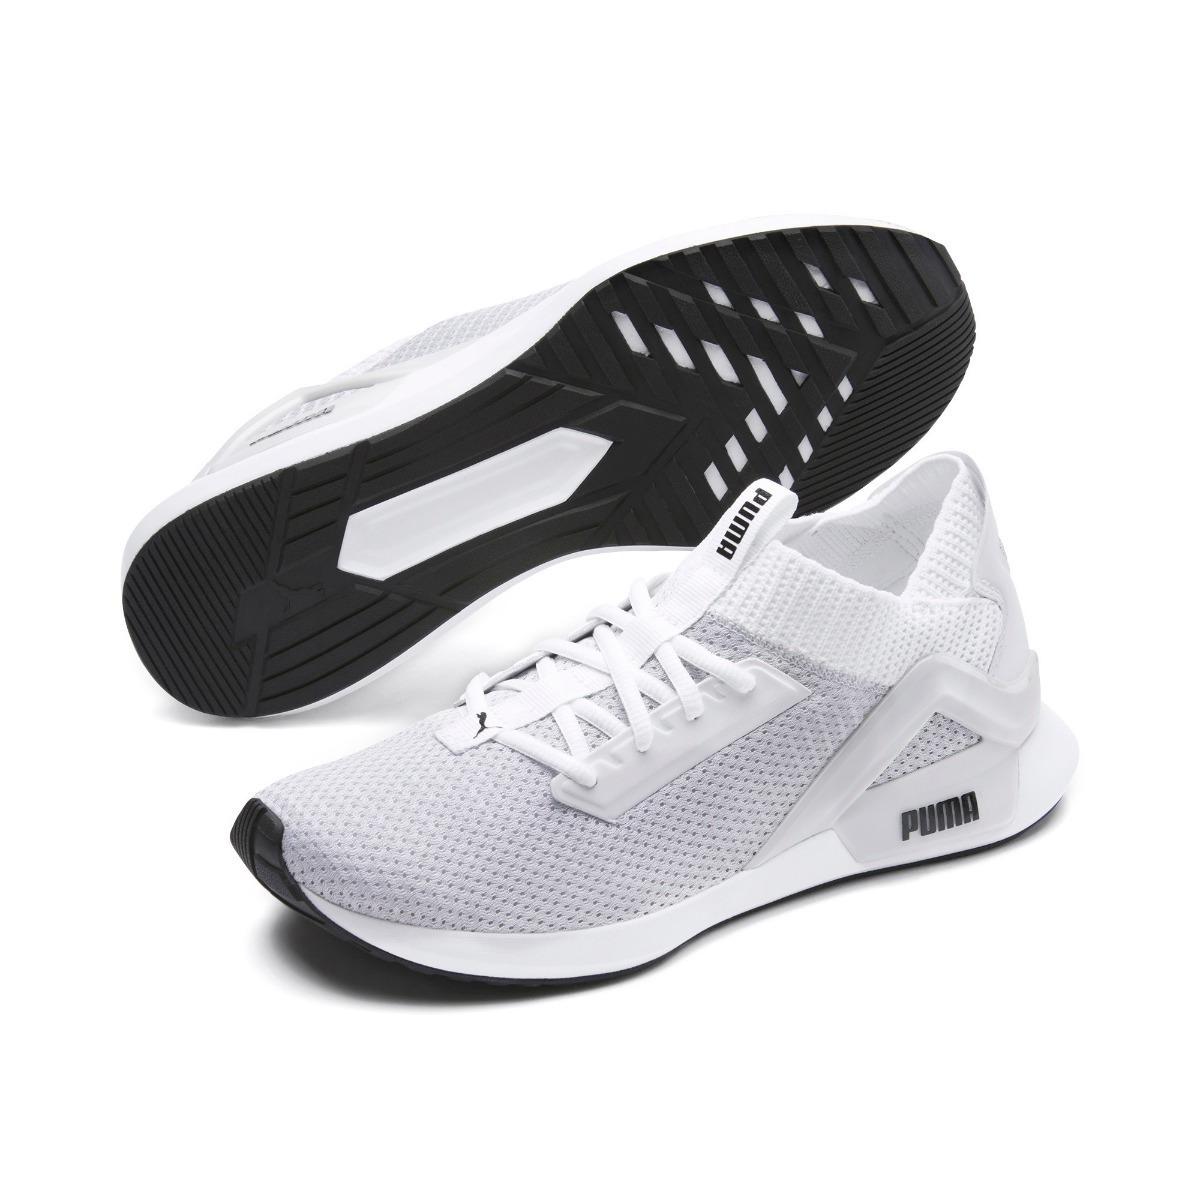 c90ccf420 tenis puma rogue blanco run correr hombre comodo original. Cargando zoom.